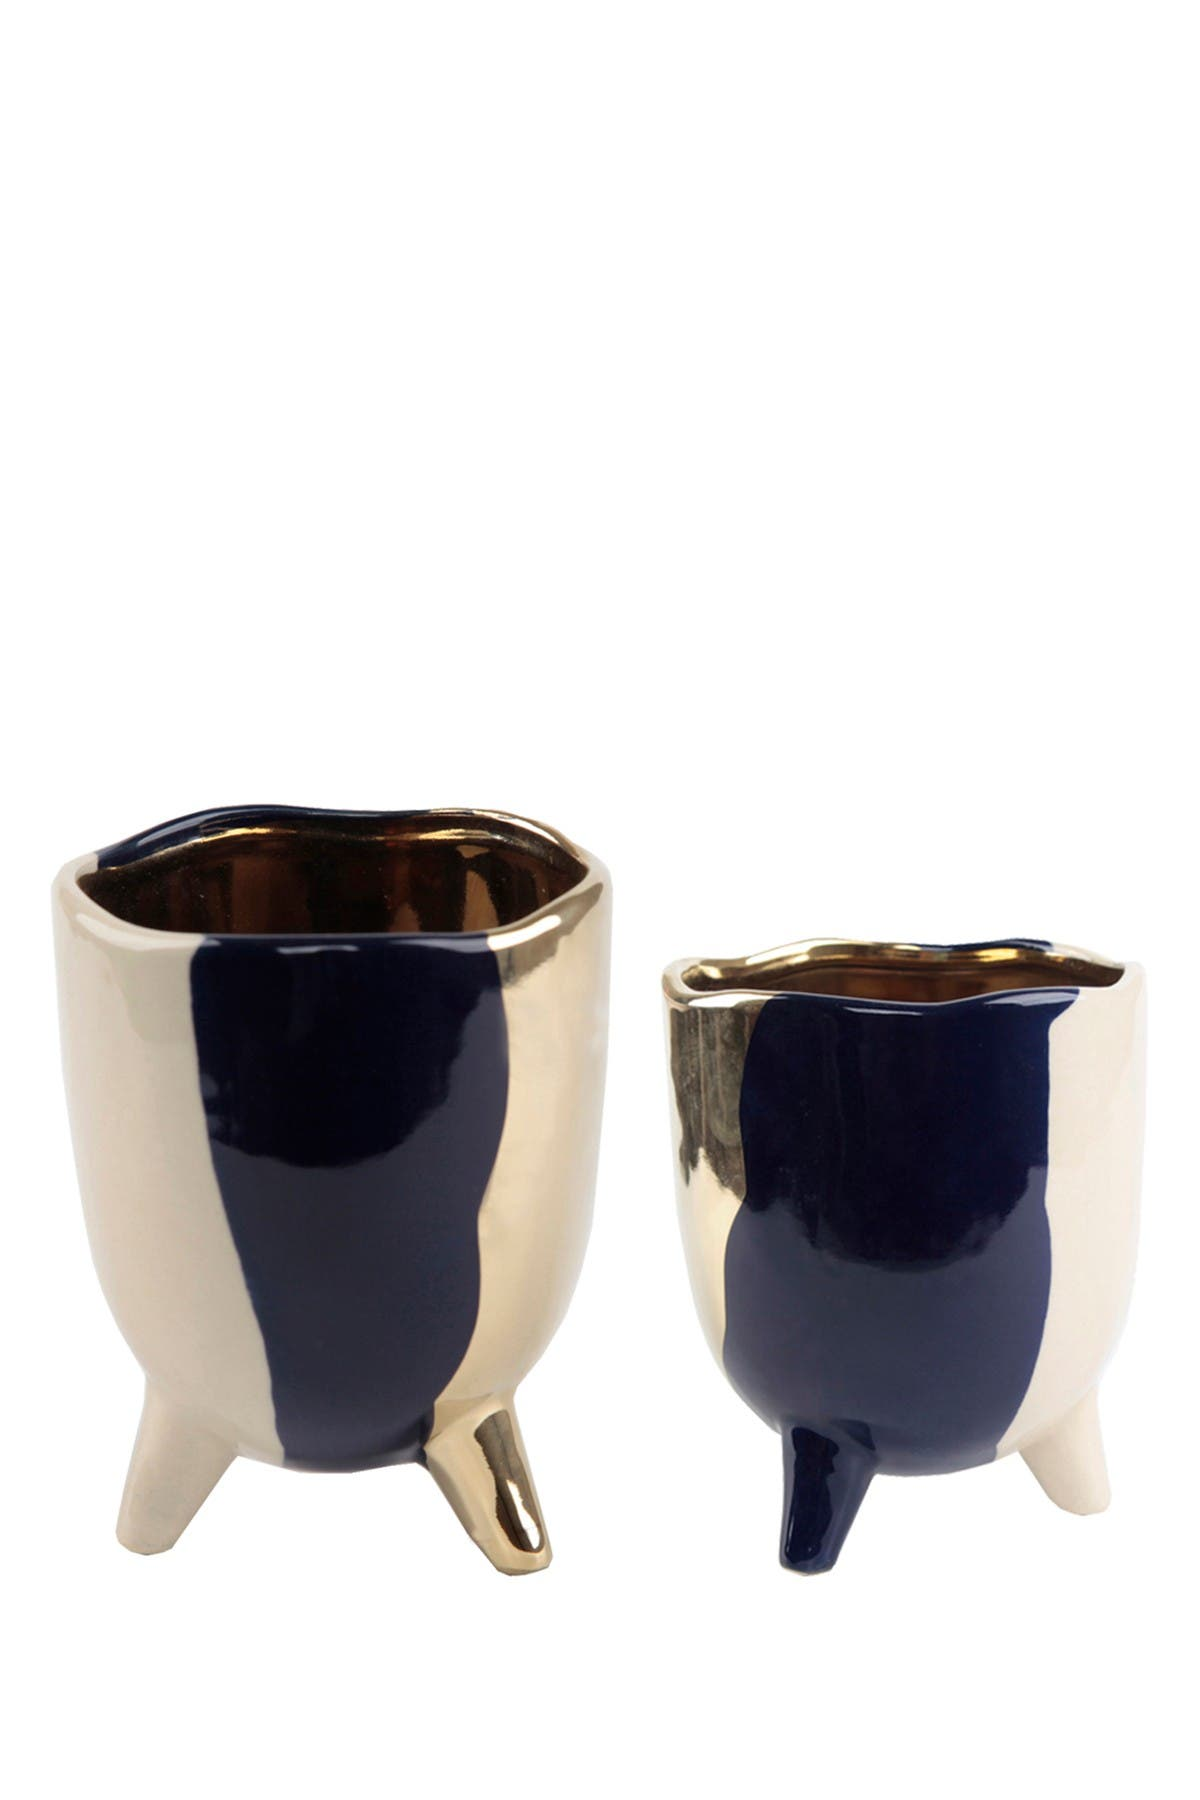 Image of FLORA BUNDA Navy Footed Ceramic Planter - Set of 2